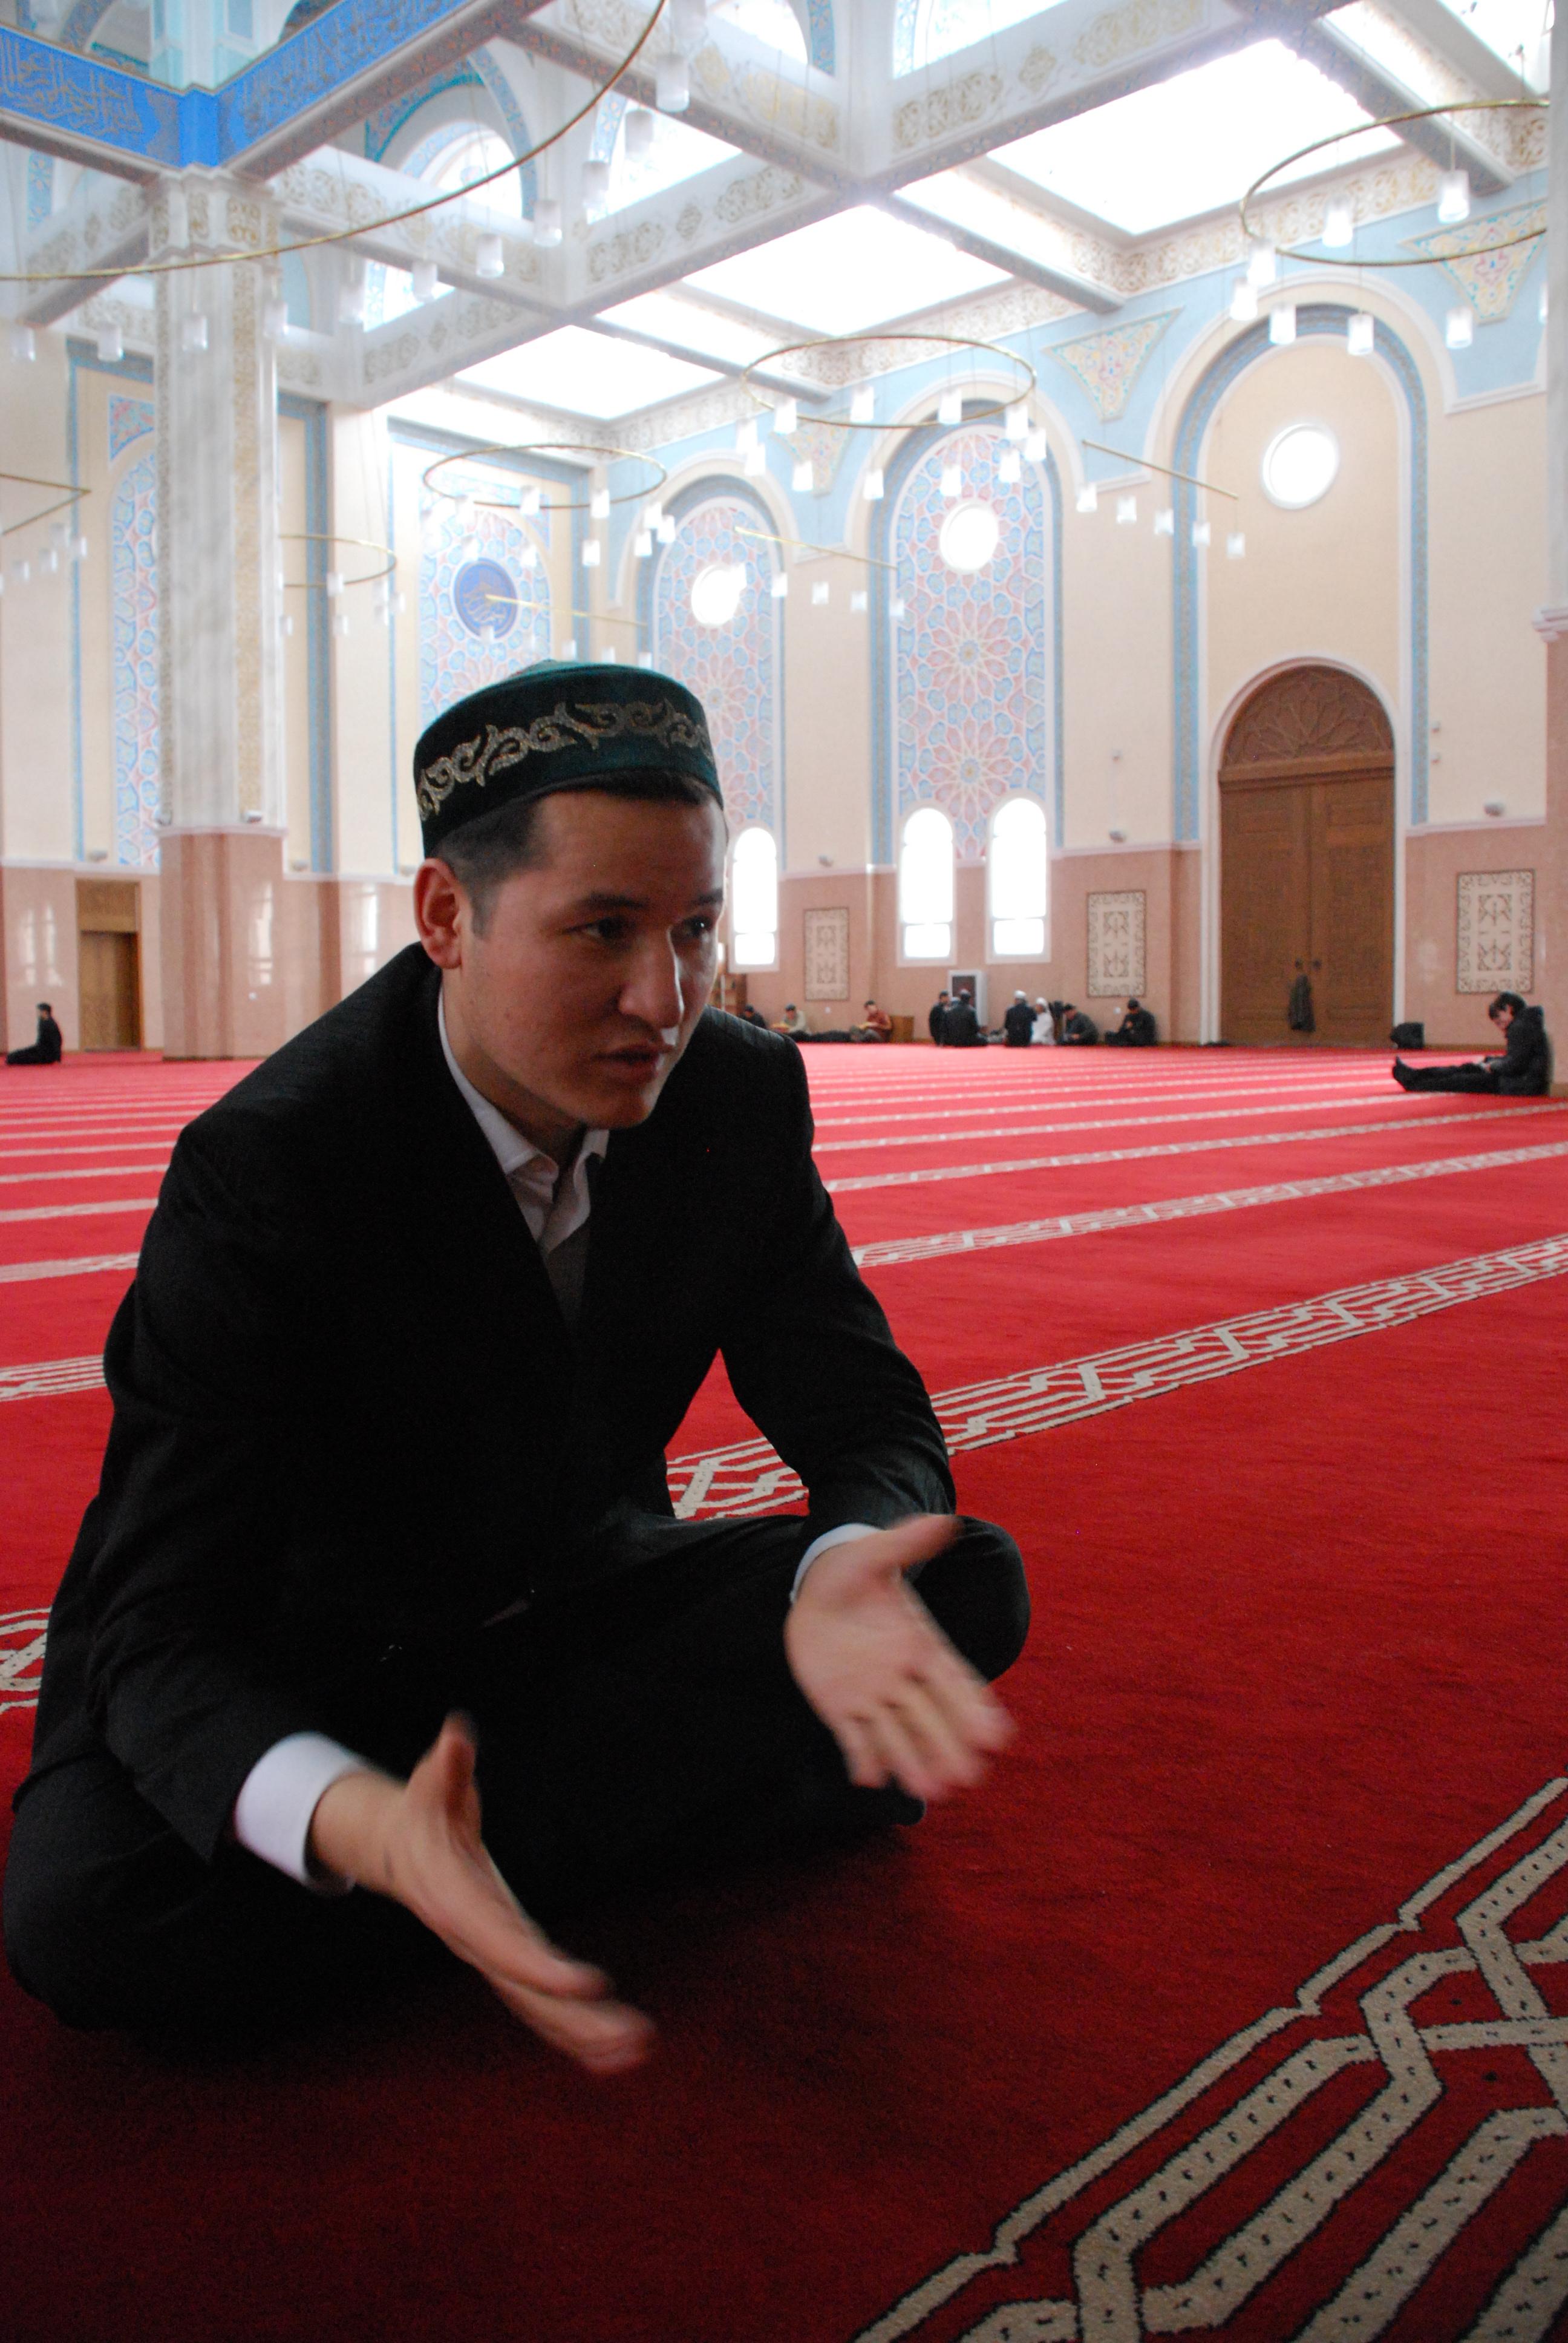 Koran teacher Adilkhan Serikbay says Kazakhs want no trouble with Jews or any other of Kazakhstan's many ethnic and religious groups. (Photo: mjj)